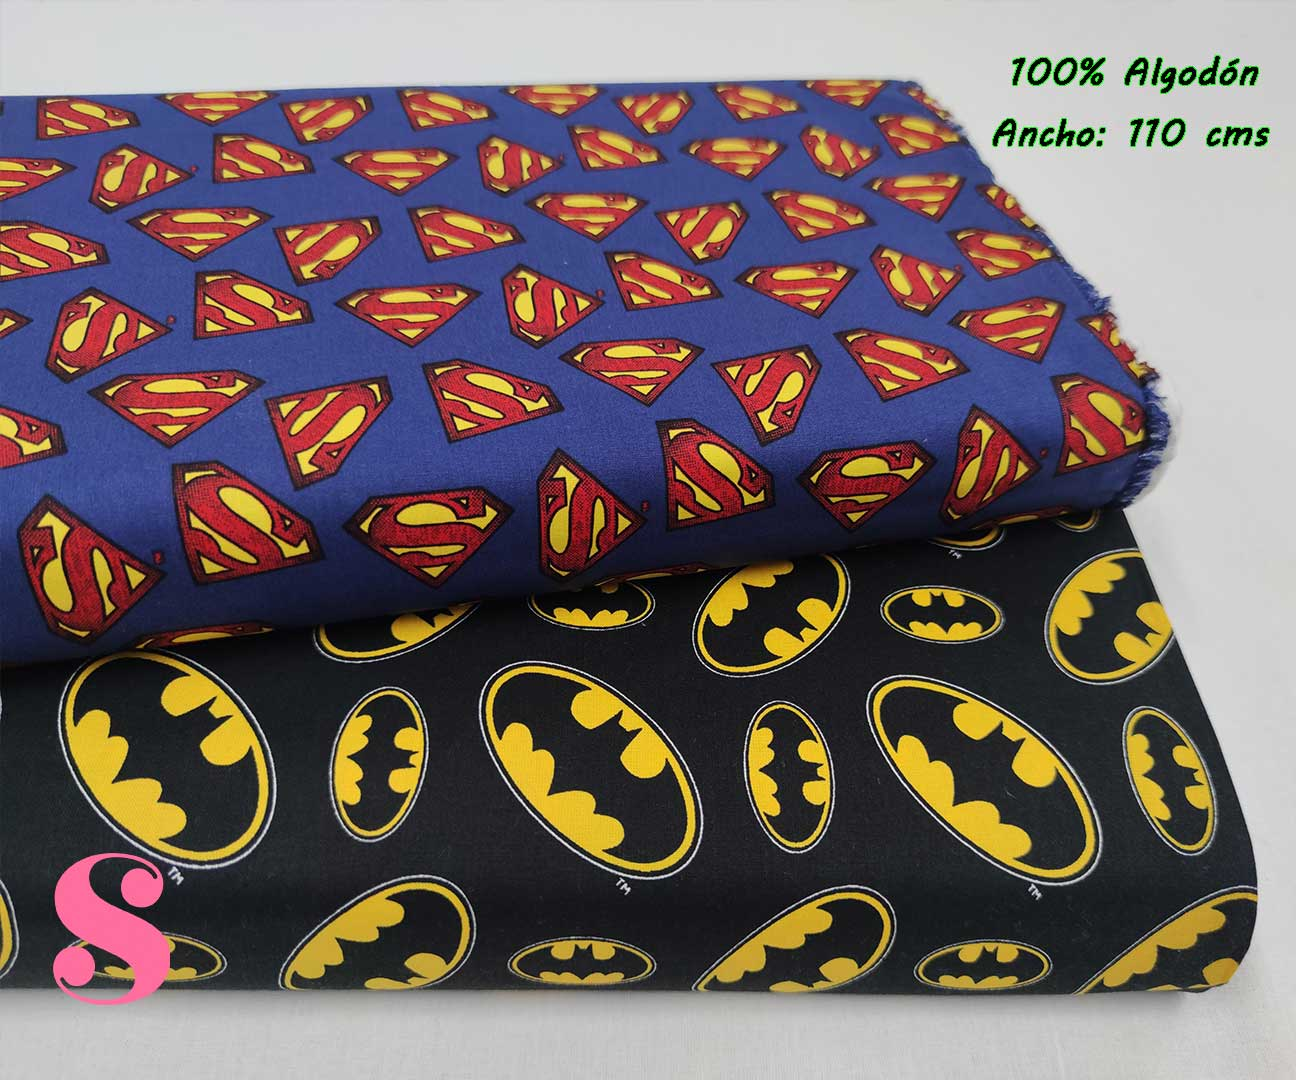 31-telas-marvel-originales,telas-frikis,estampados-frikis,estampados-marvel-originales,Tejido Estampado Patch Americano Batman Logotipo Fondo Negro,Tejido Estampado Patch Americano Superman Logotipo Fondo Azul,Tejido Estampado Patch Americano Superman Logotipo Fondo Negro